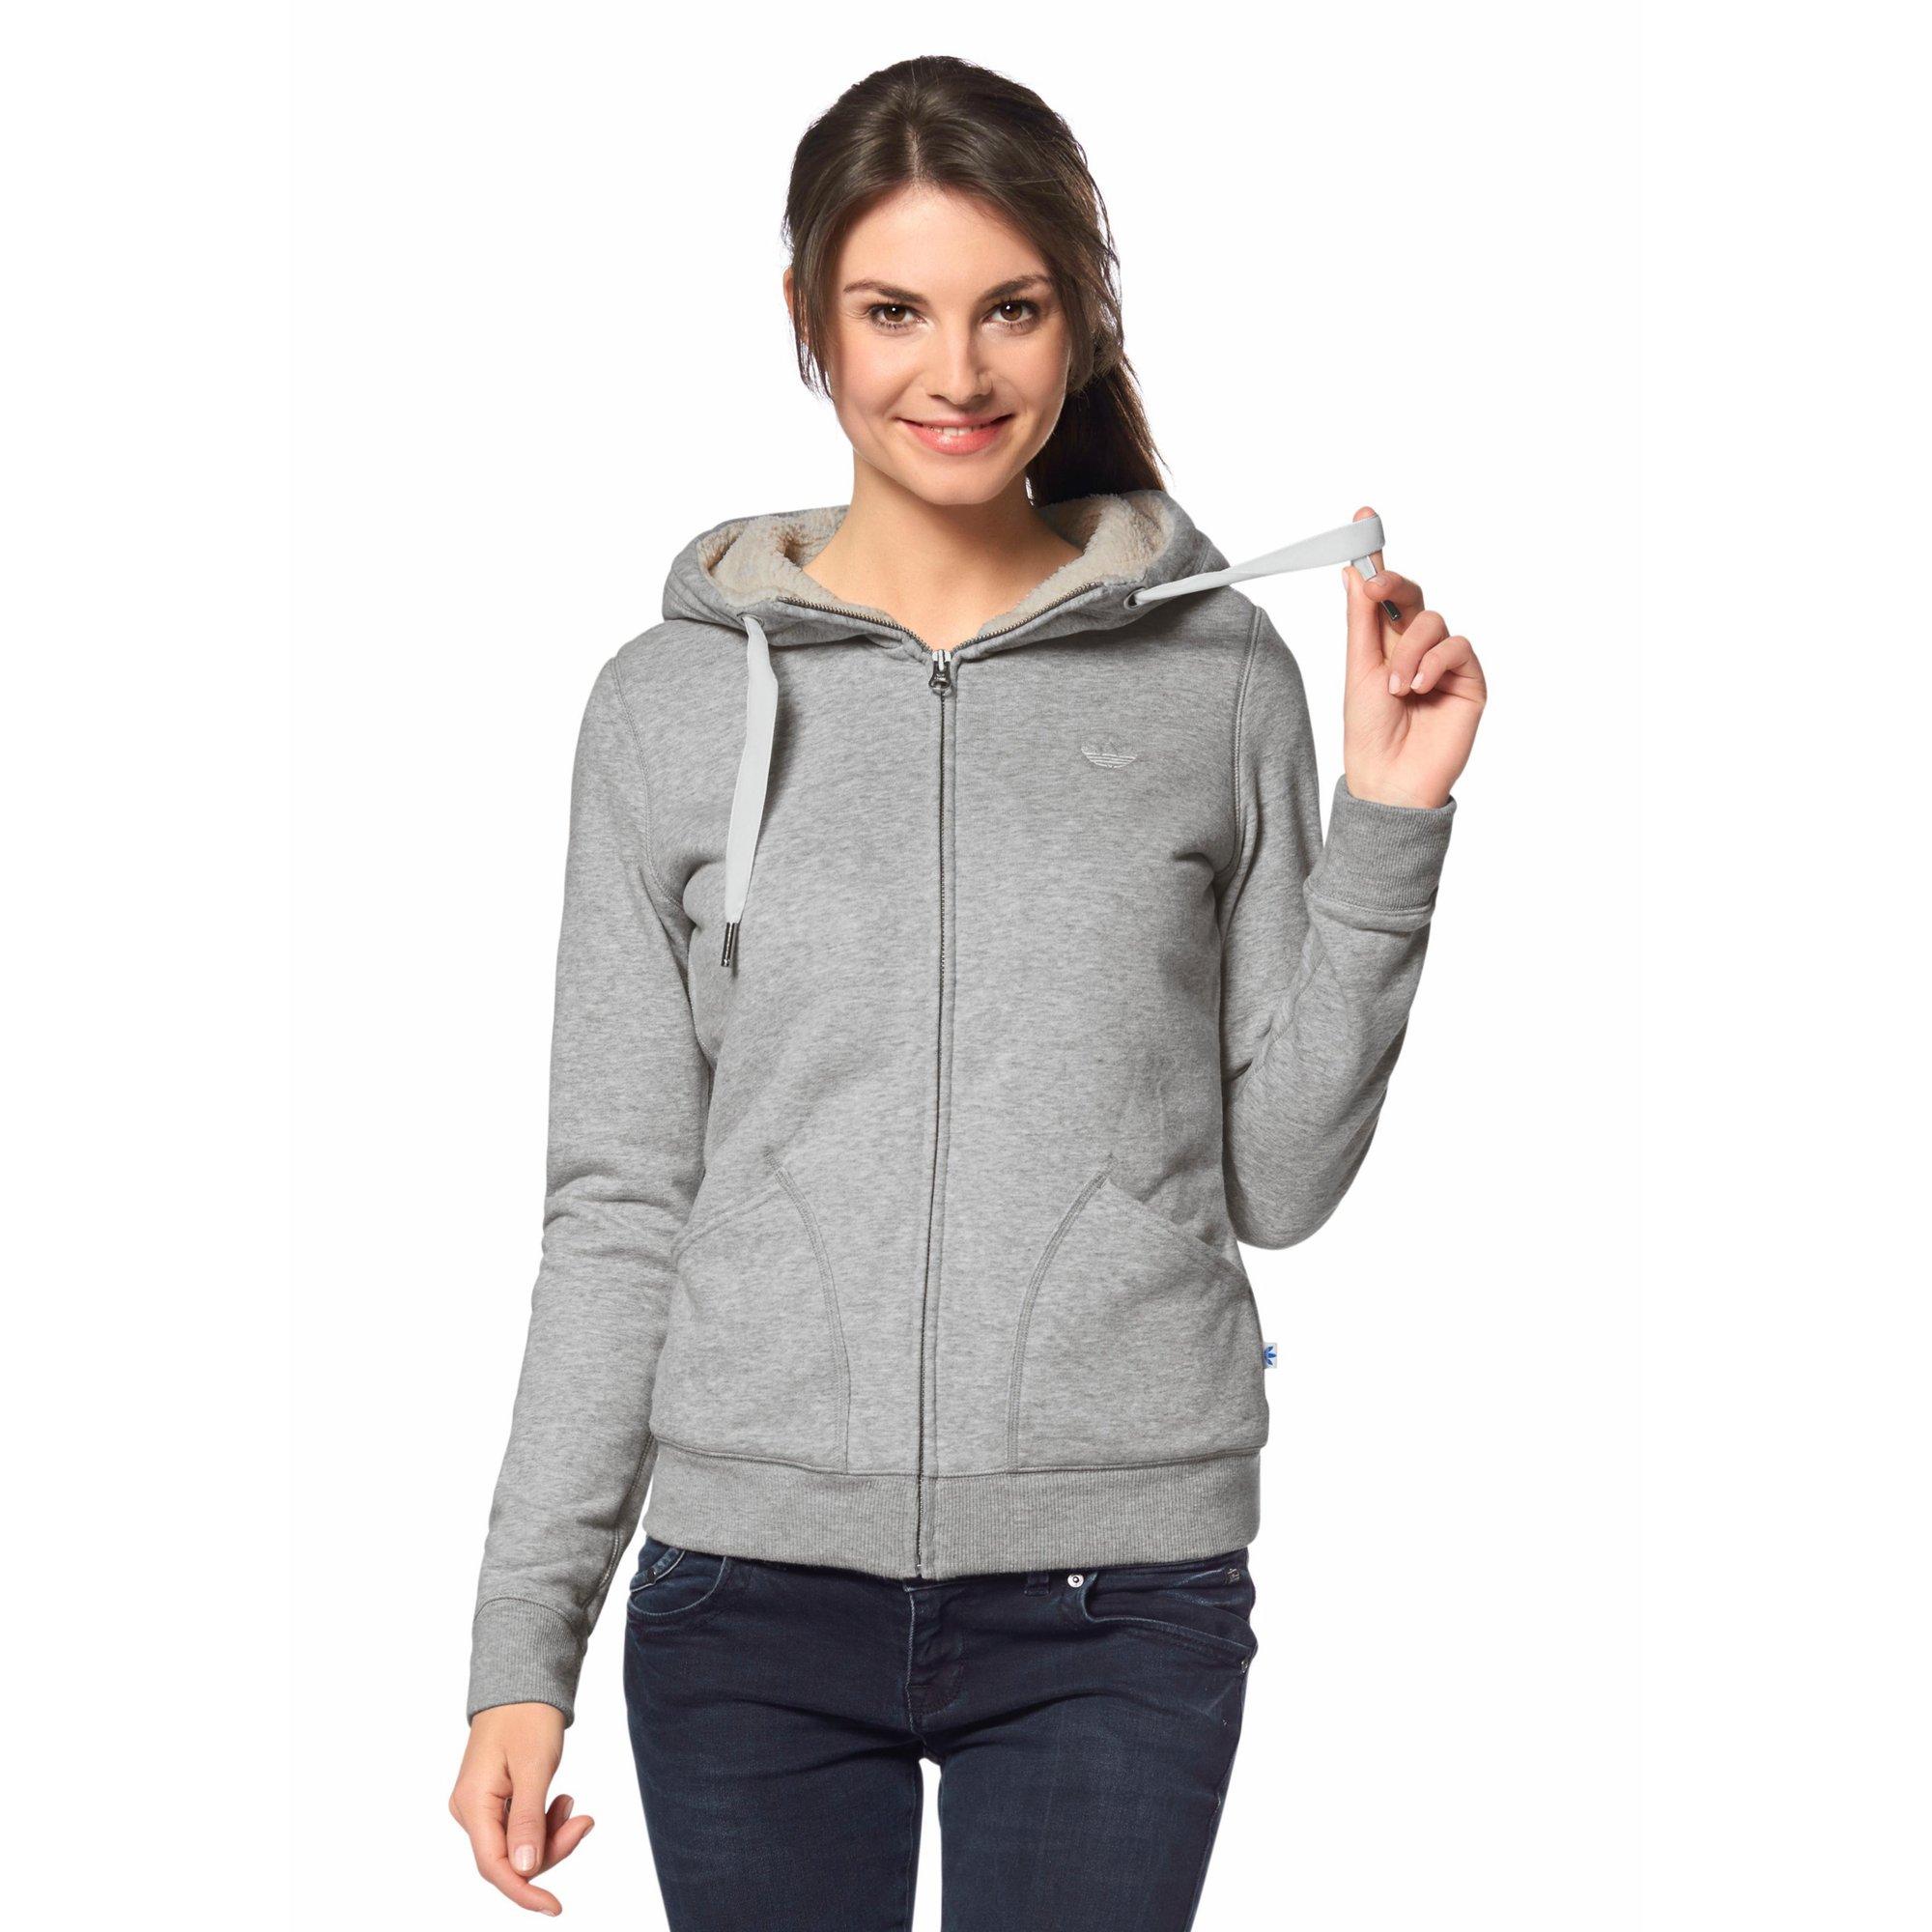 La Femme Capuche Zippé 8wq4x Soldes Sweat Adidas Originals À qwFn6ZtT